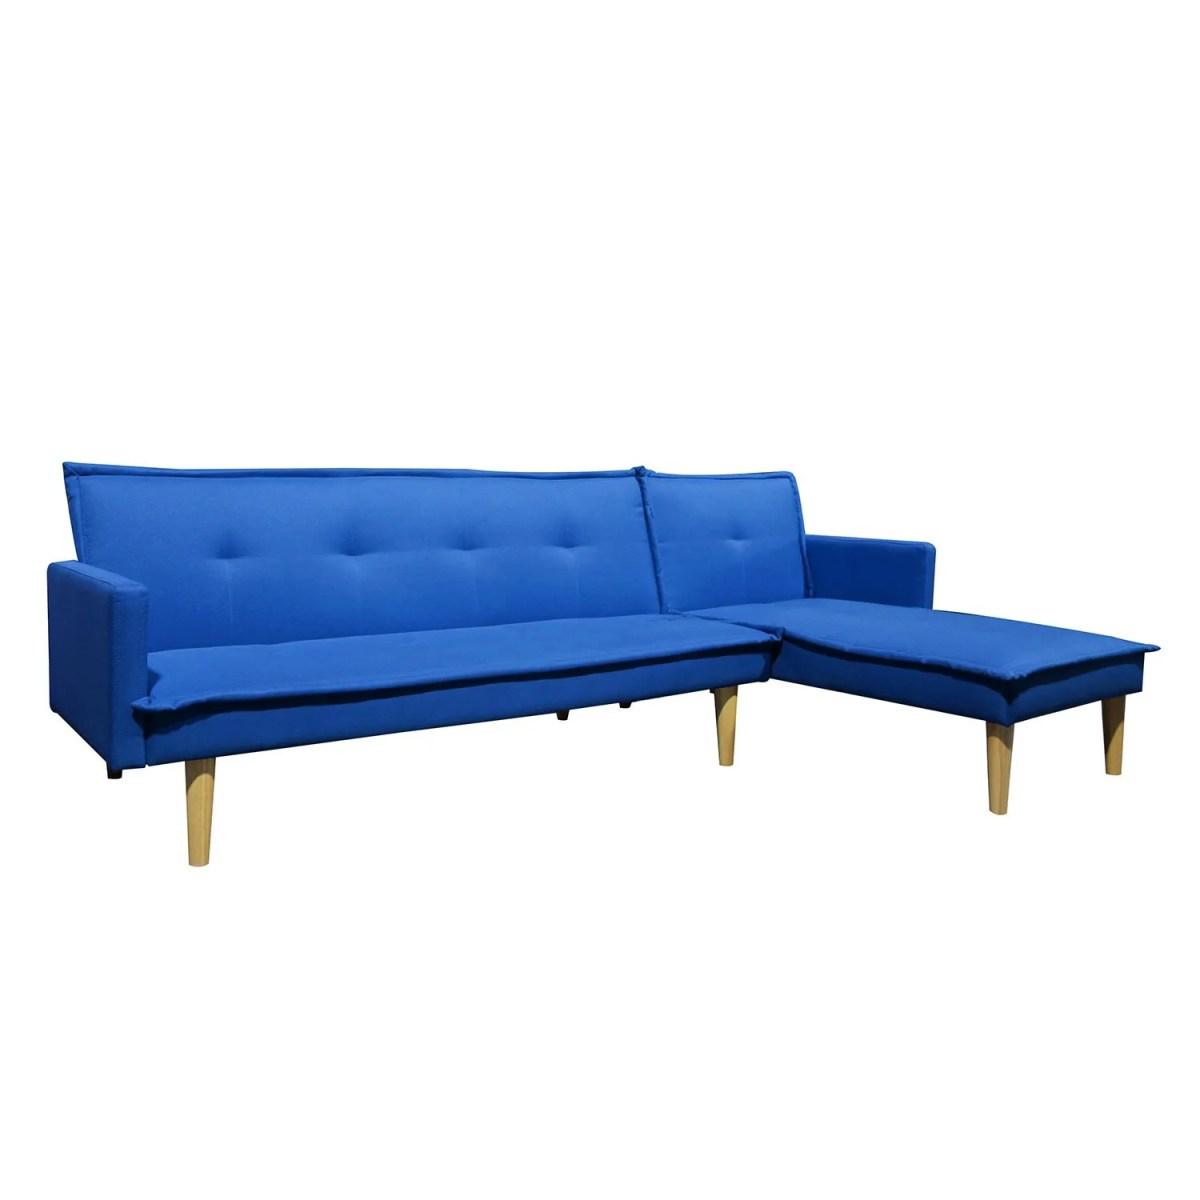 sala esquinada sofá cama independencia azul 2